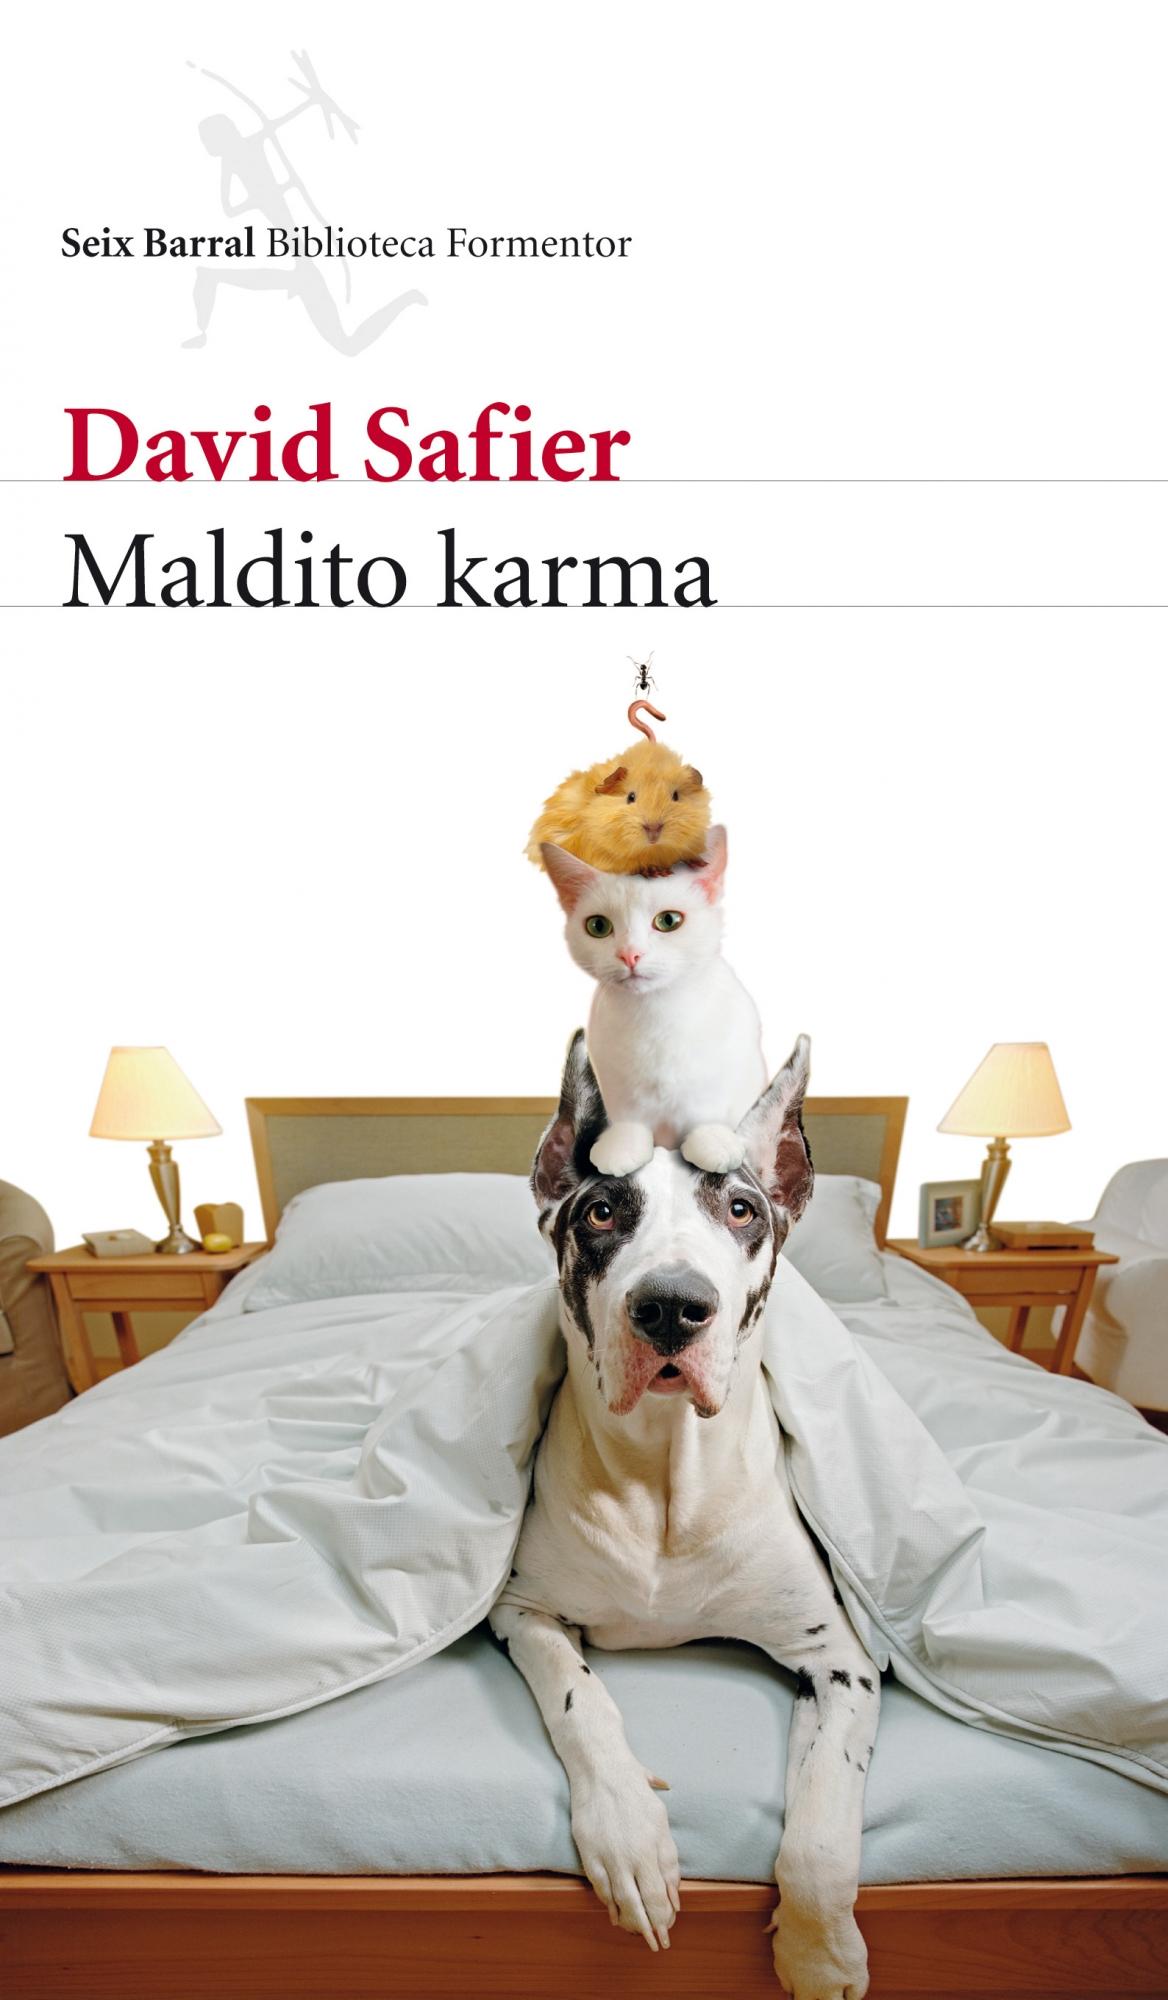 libro-ebook-maldito-karma-david-safier